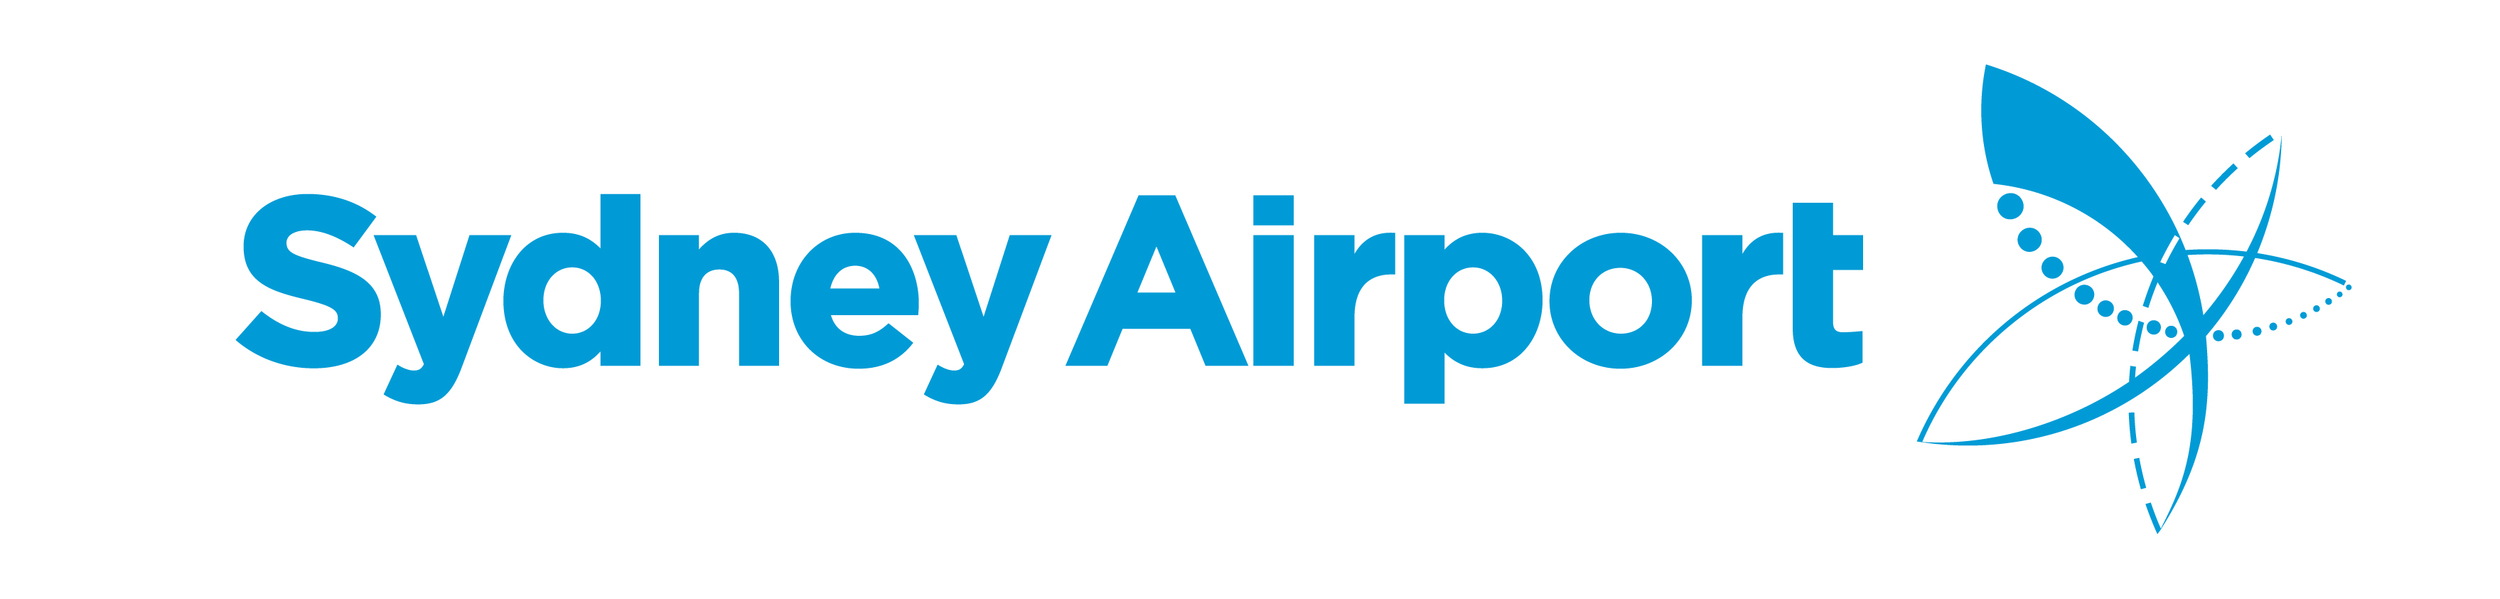 SydneyAirport_Logo_2014_ART_H Colour RGB.jpg